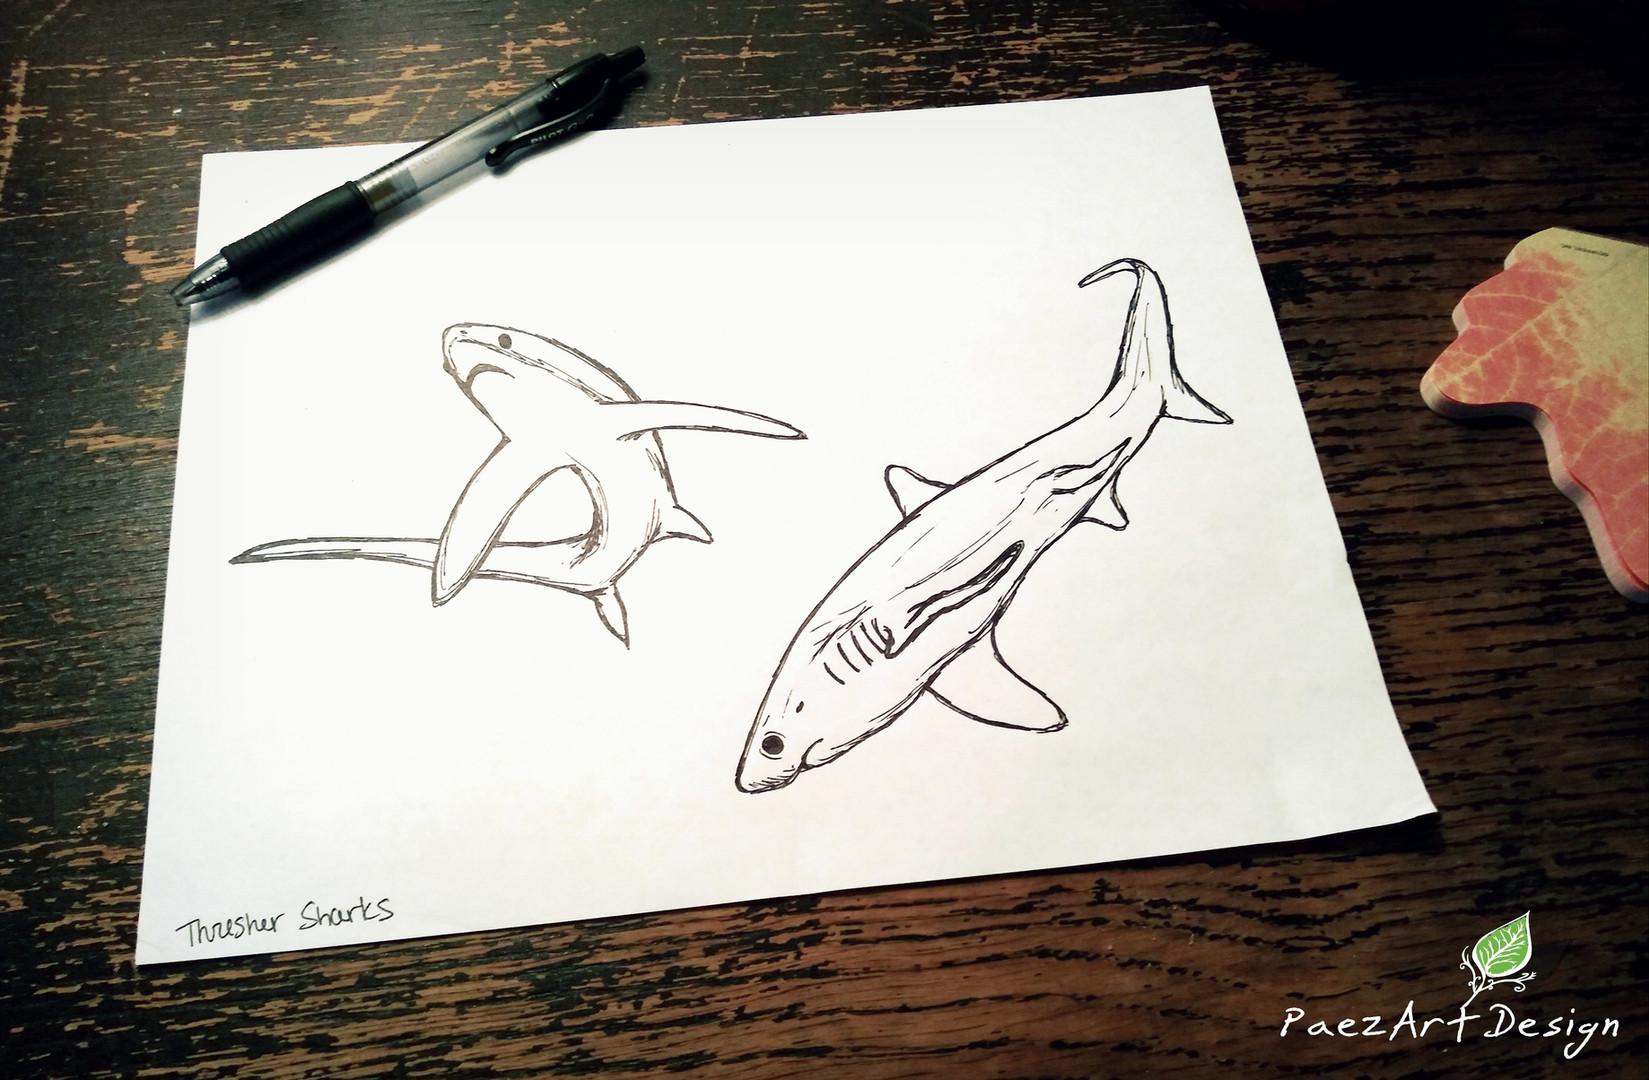 Thresher Shark Sketches